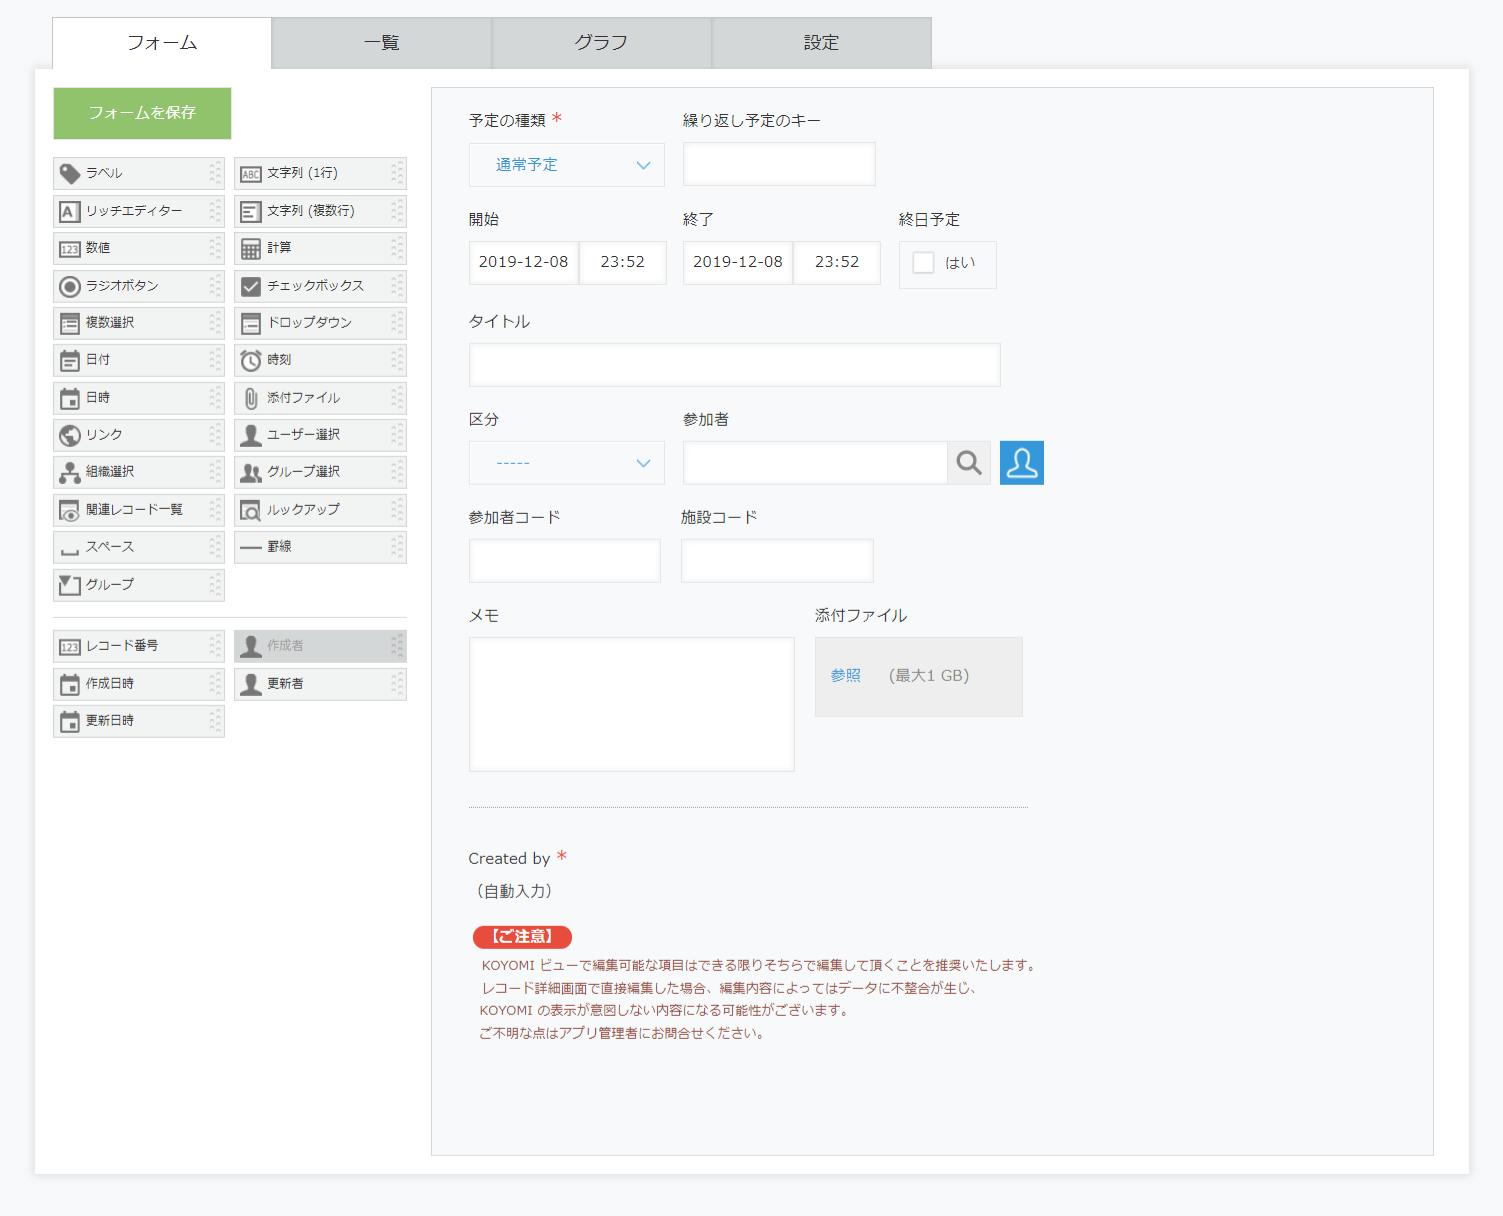 [kintone-google双方向連携]KOYOMIアプリ設定